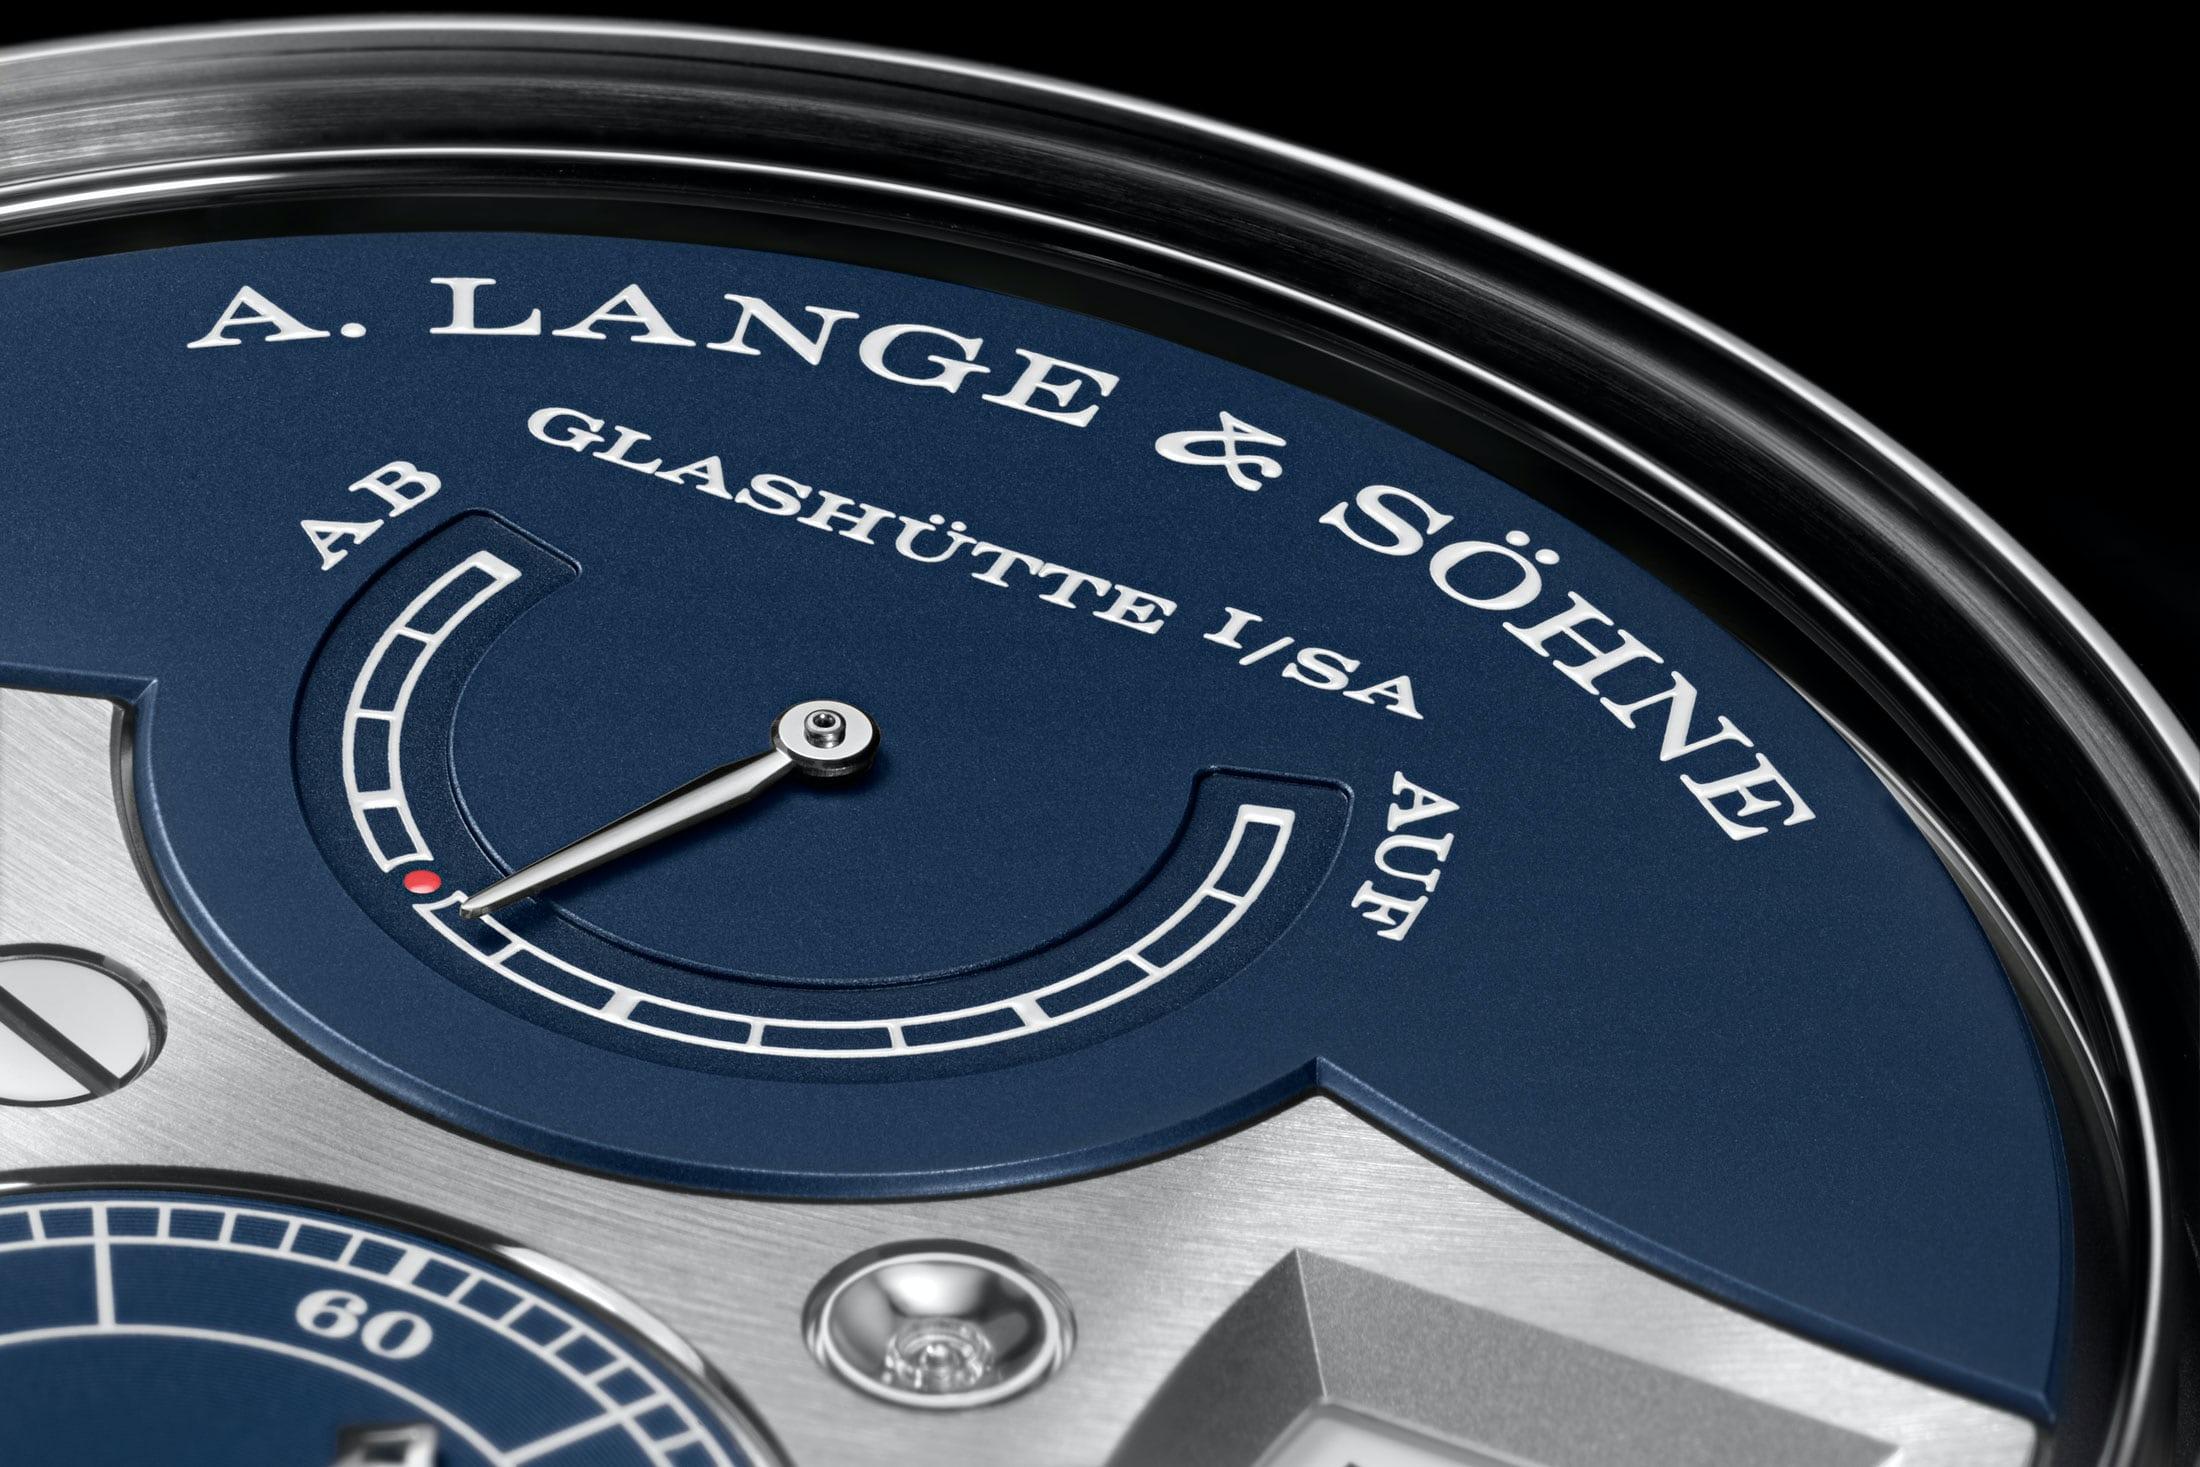 A. Lange & Söhne Zeitwerk Minute Repeater